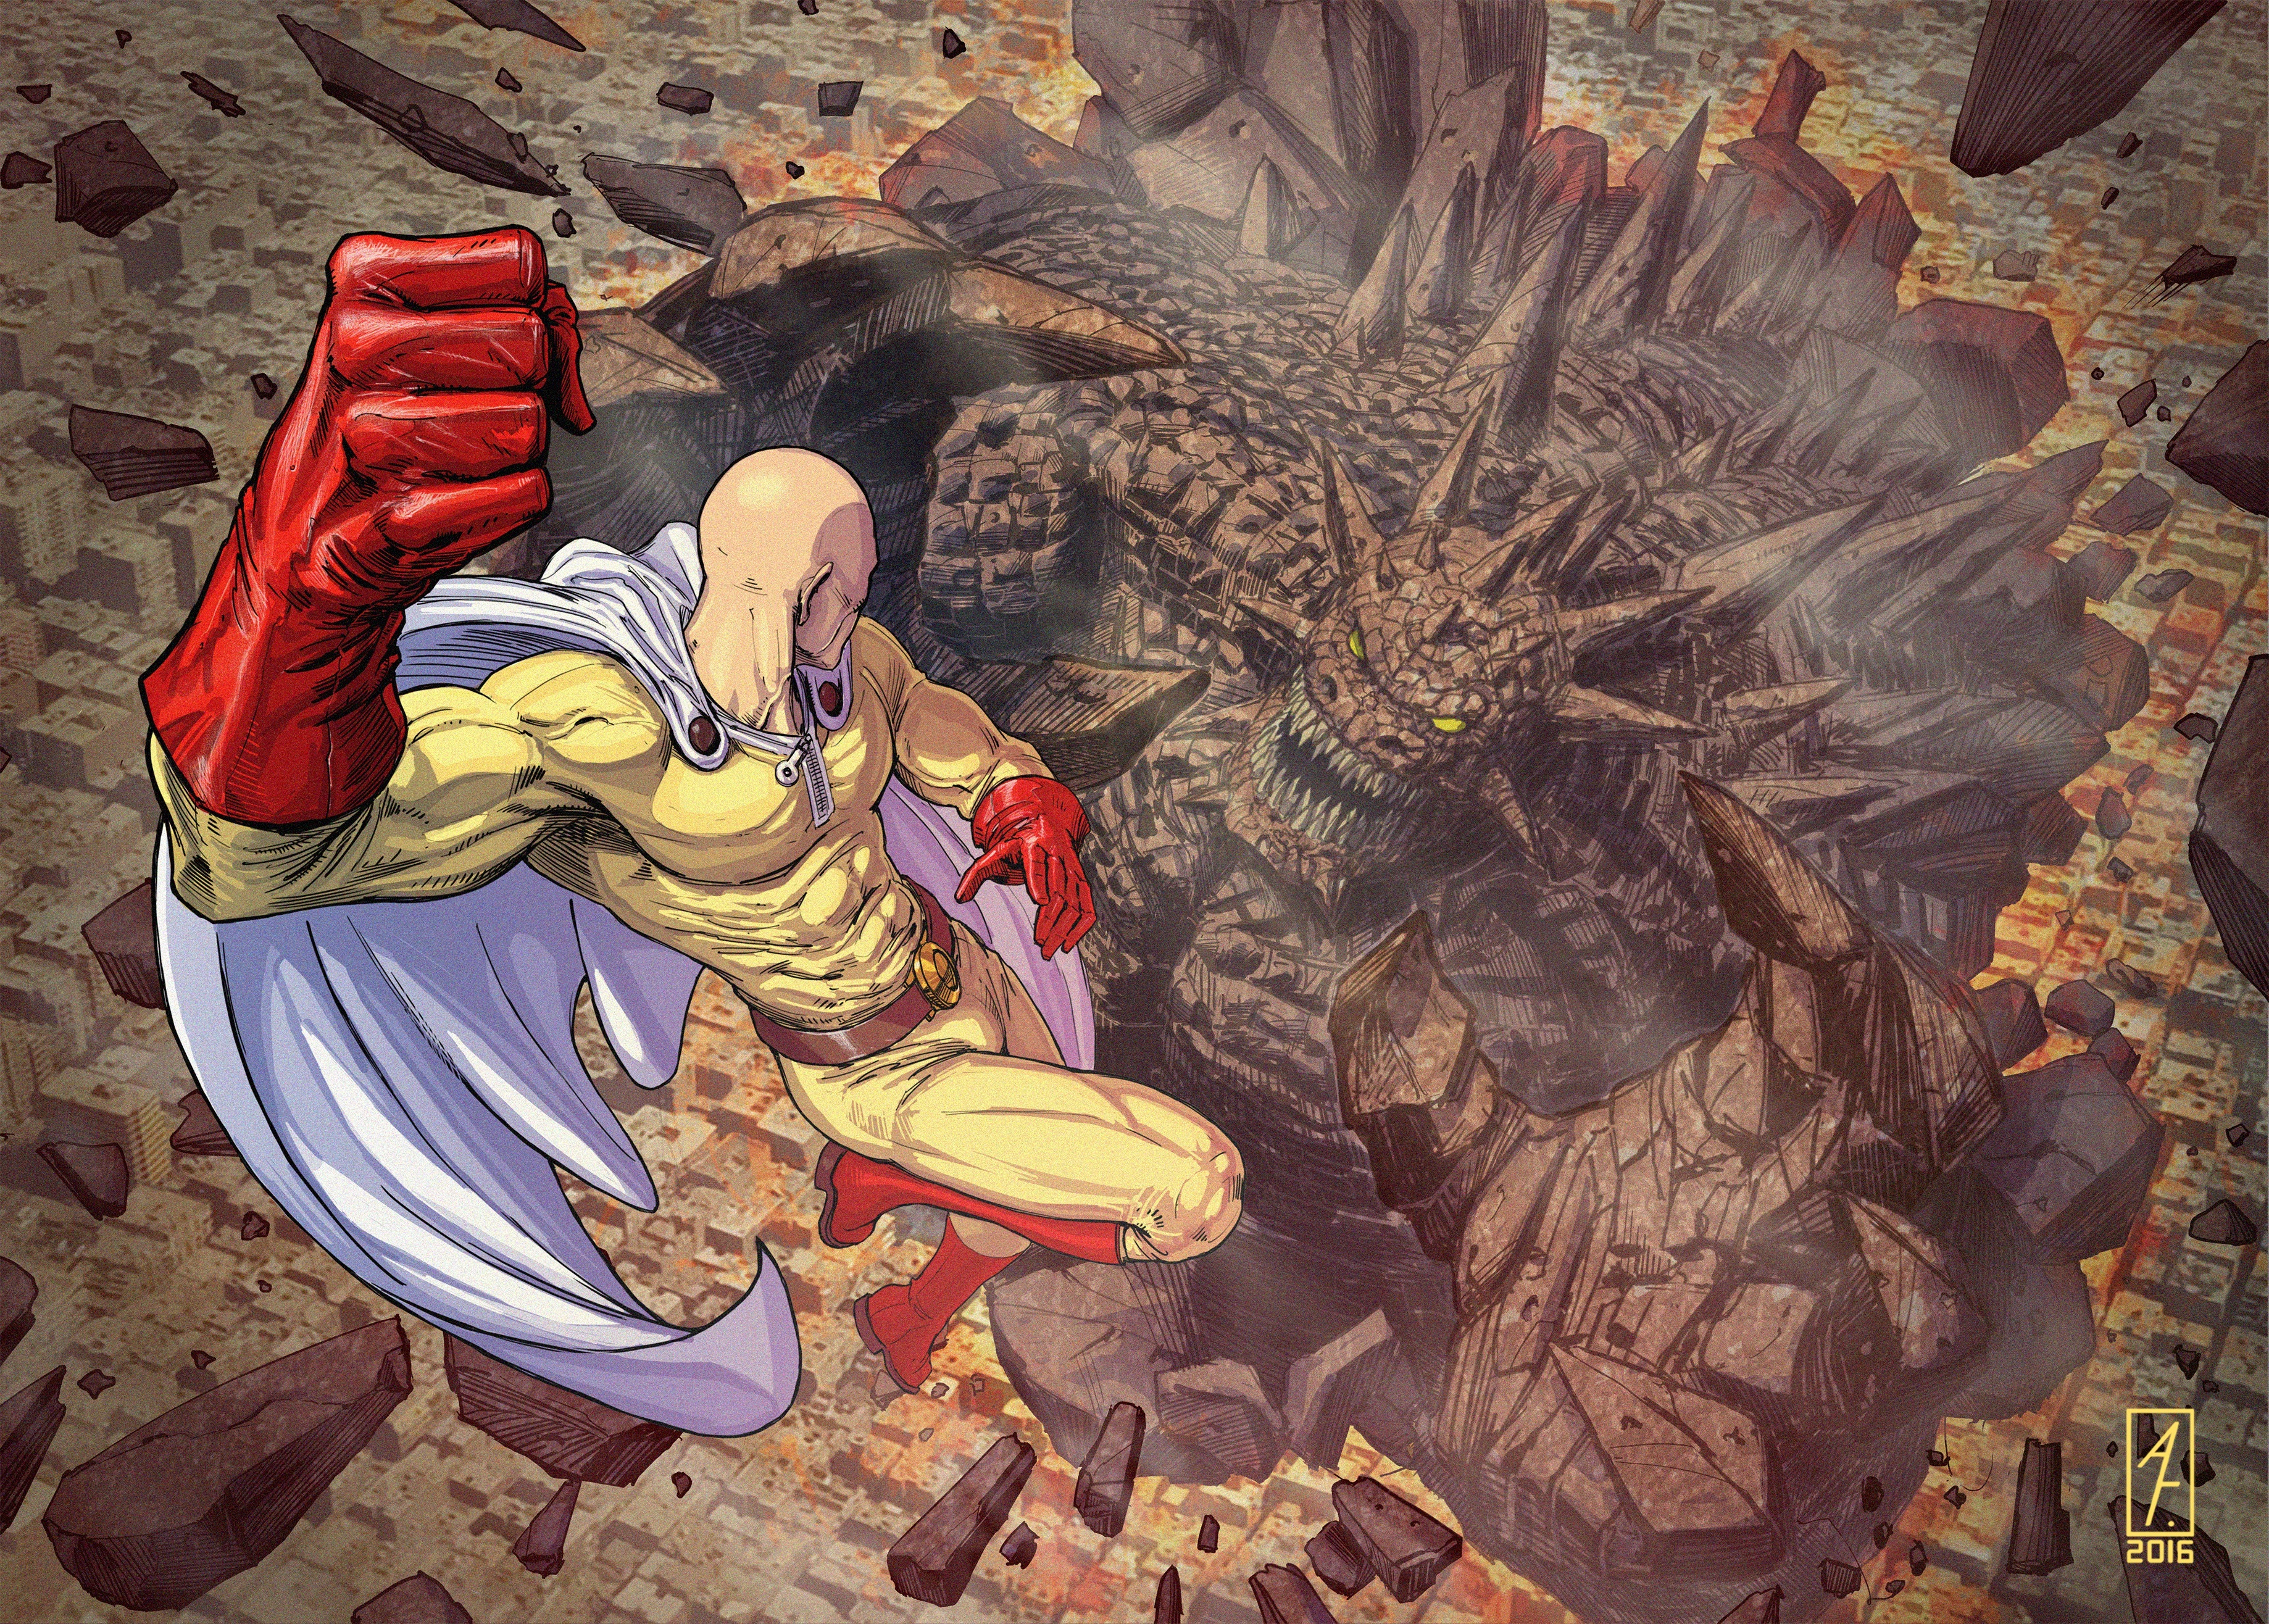 Saitama One Punch Man 4k, HD Anime, 4k Wallpapers, Images ...